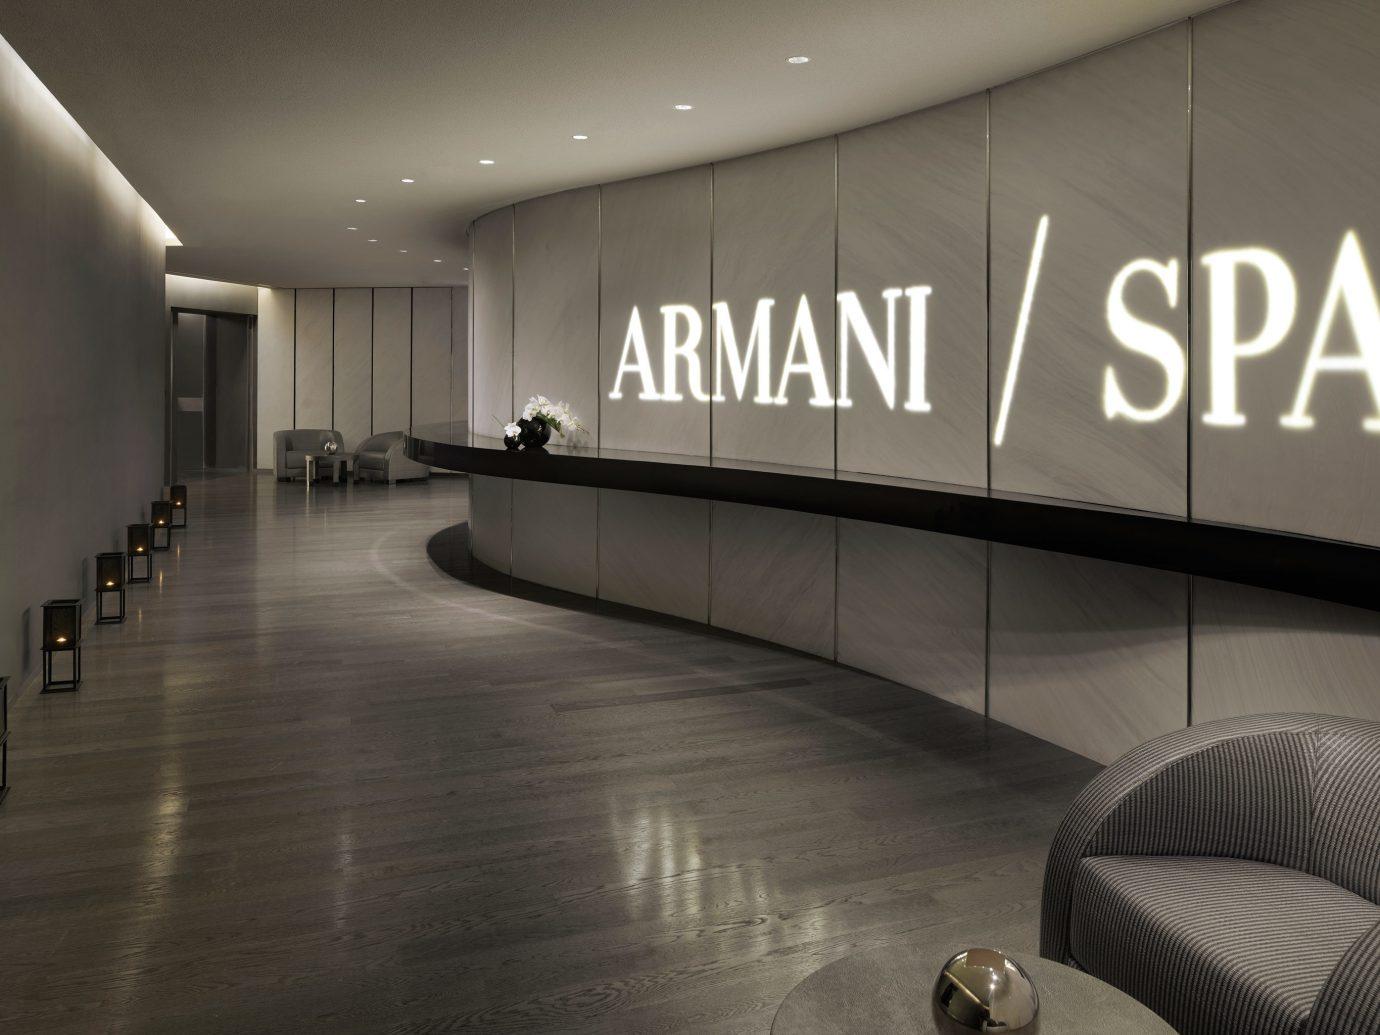 City Dubai Hotels Luxury Travel Middle East Modern Spa indoor floor ceiling wall room interior design Design furniture